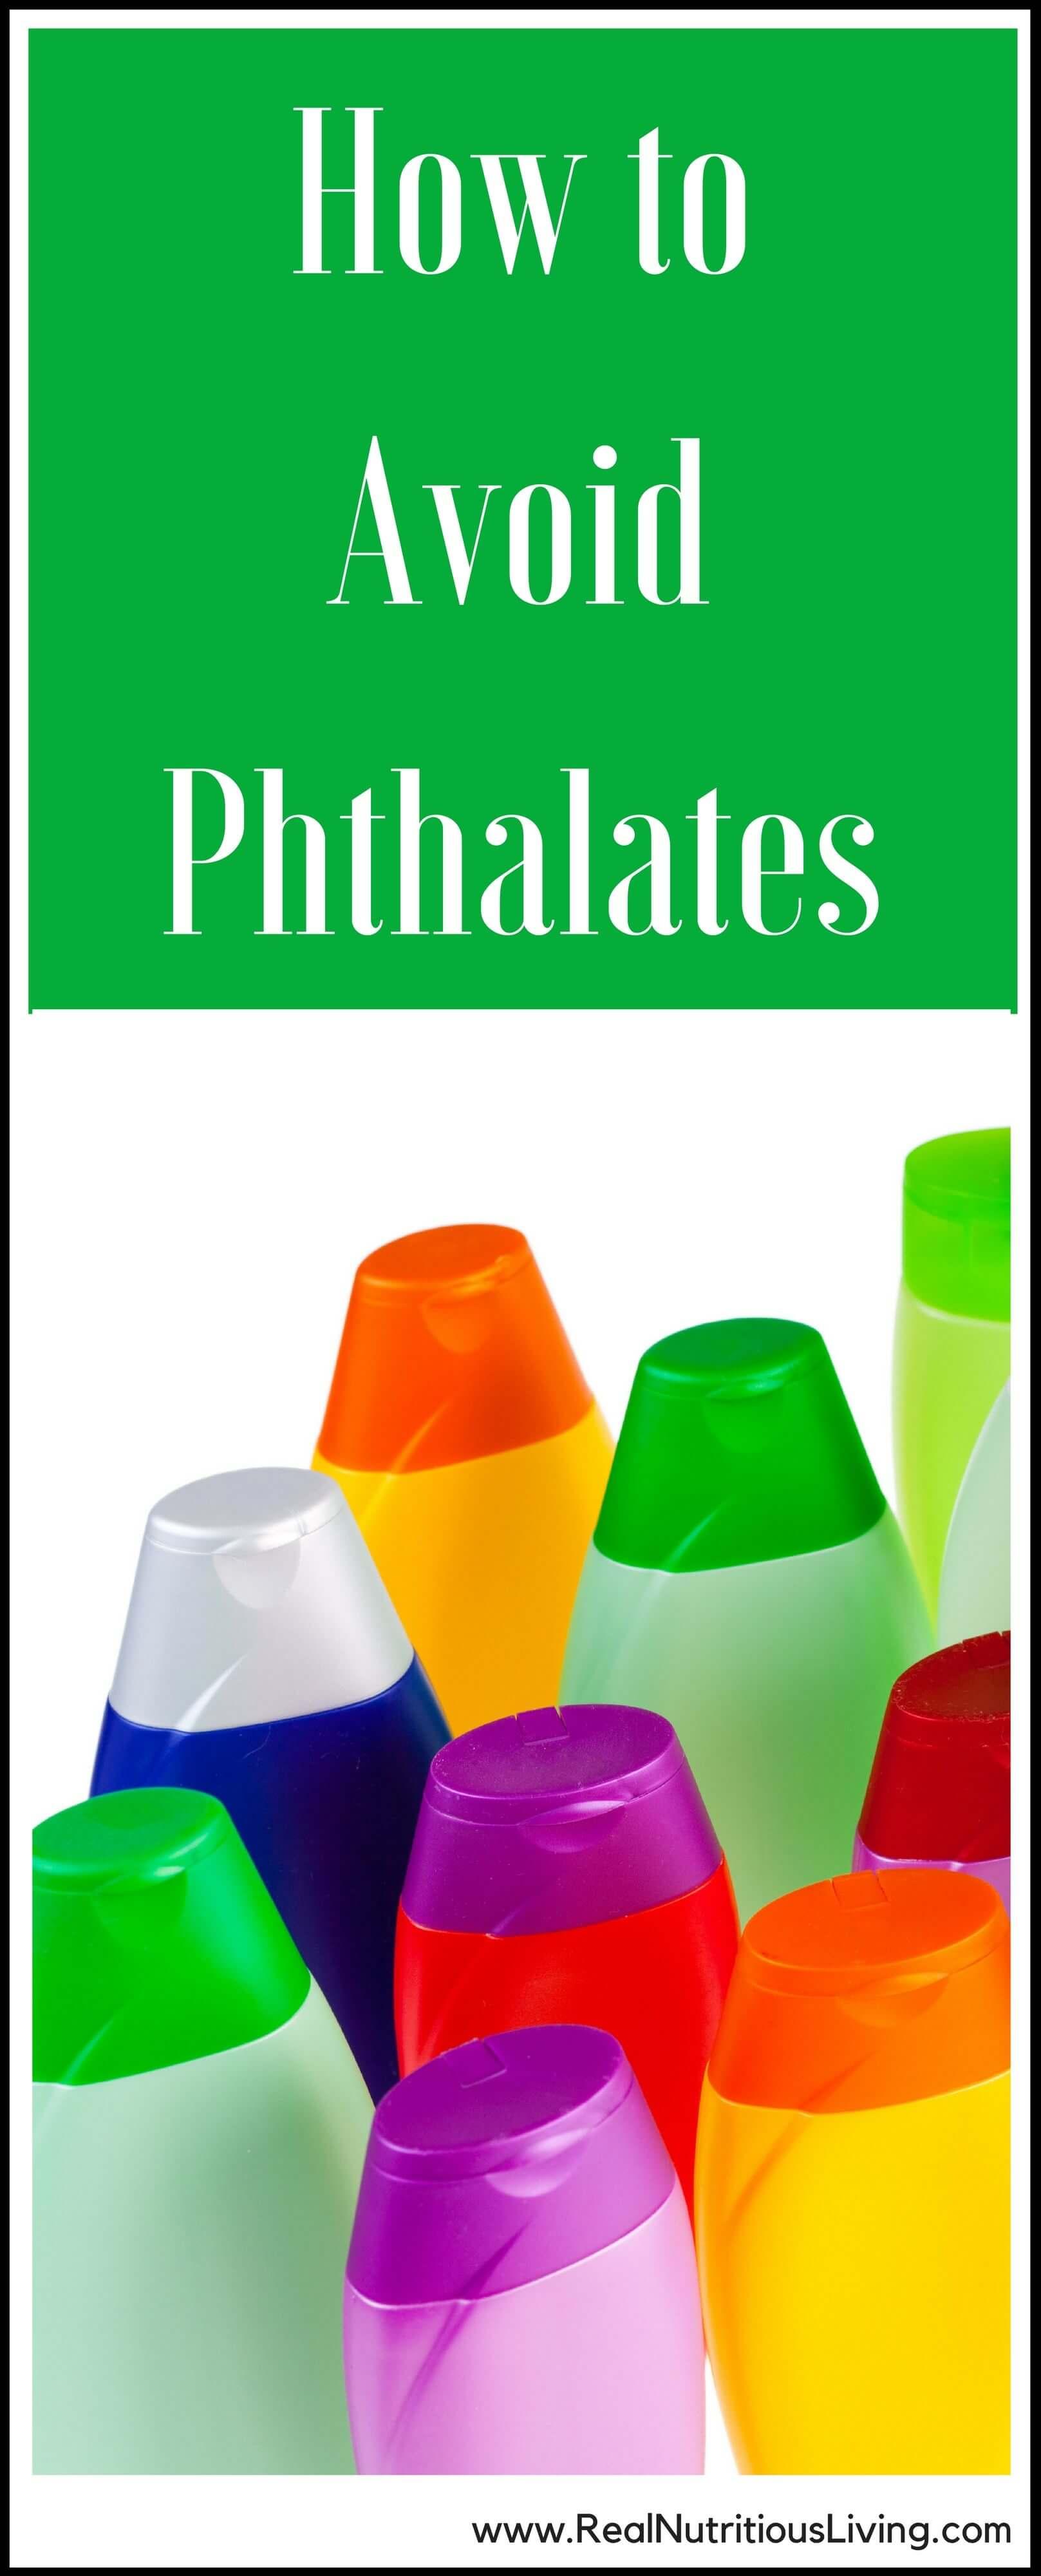 How to Avoid Phthalates // realnutritiousliving.com